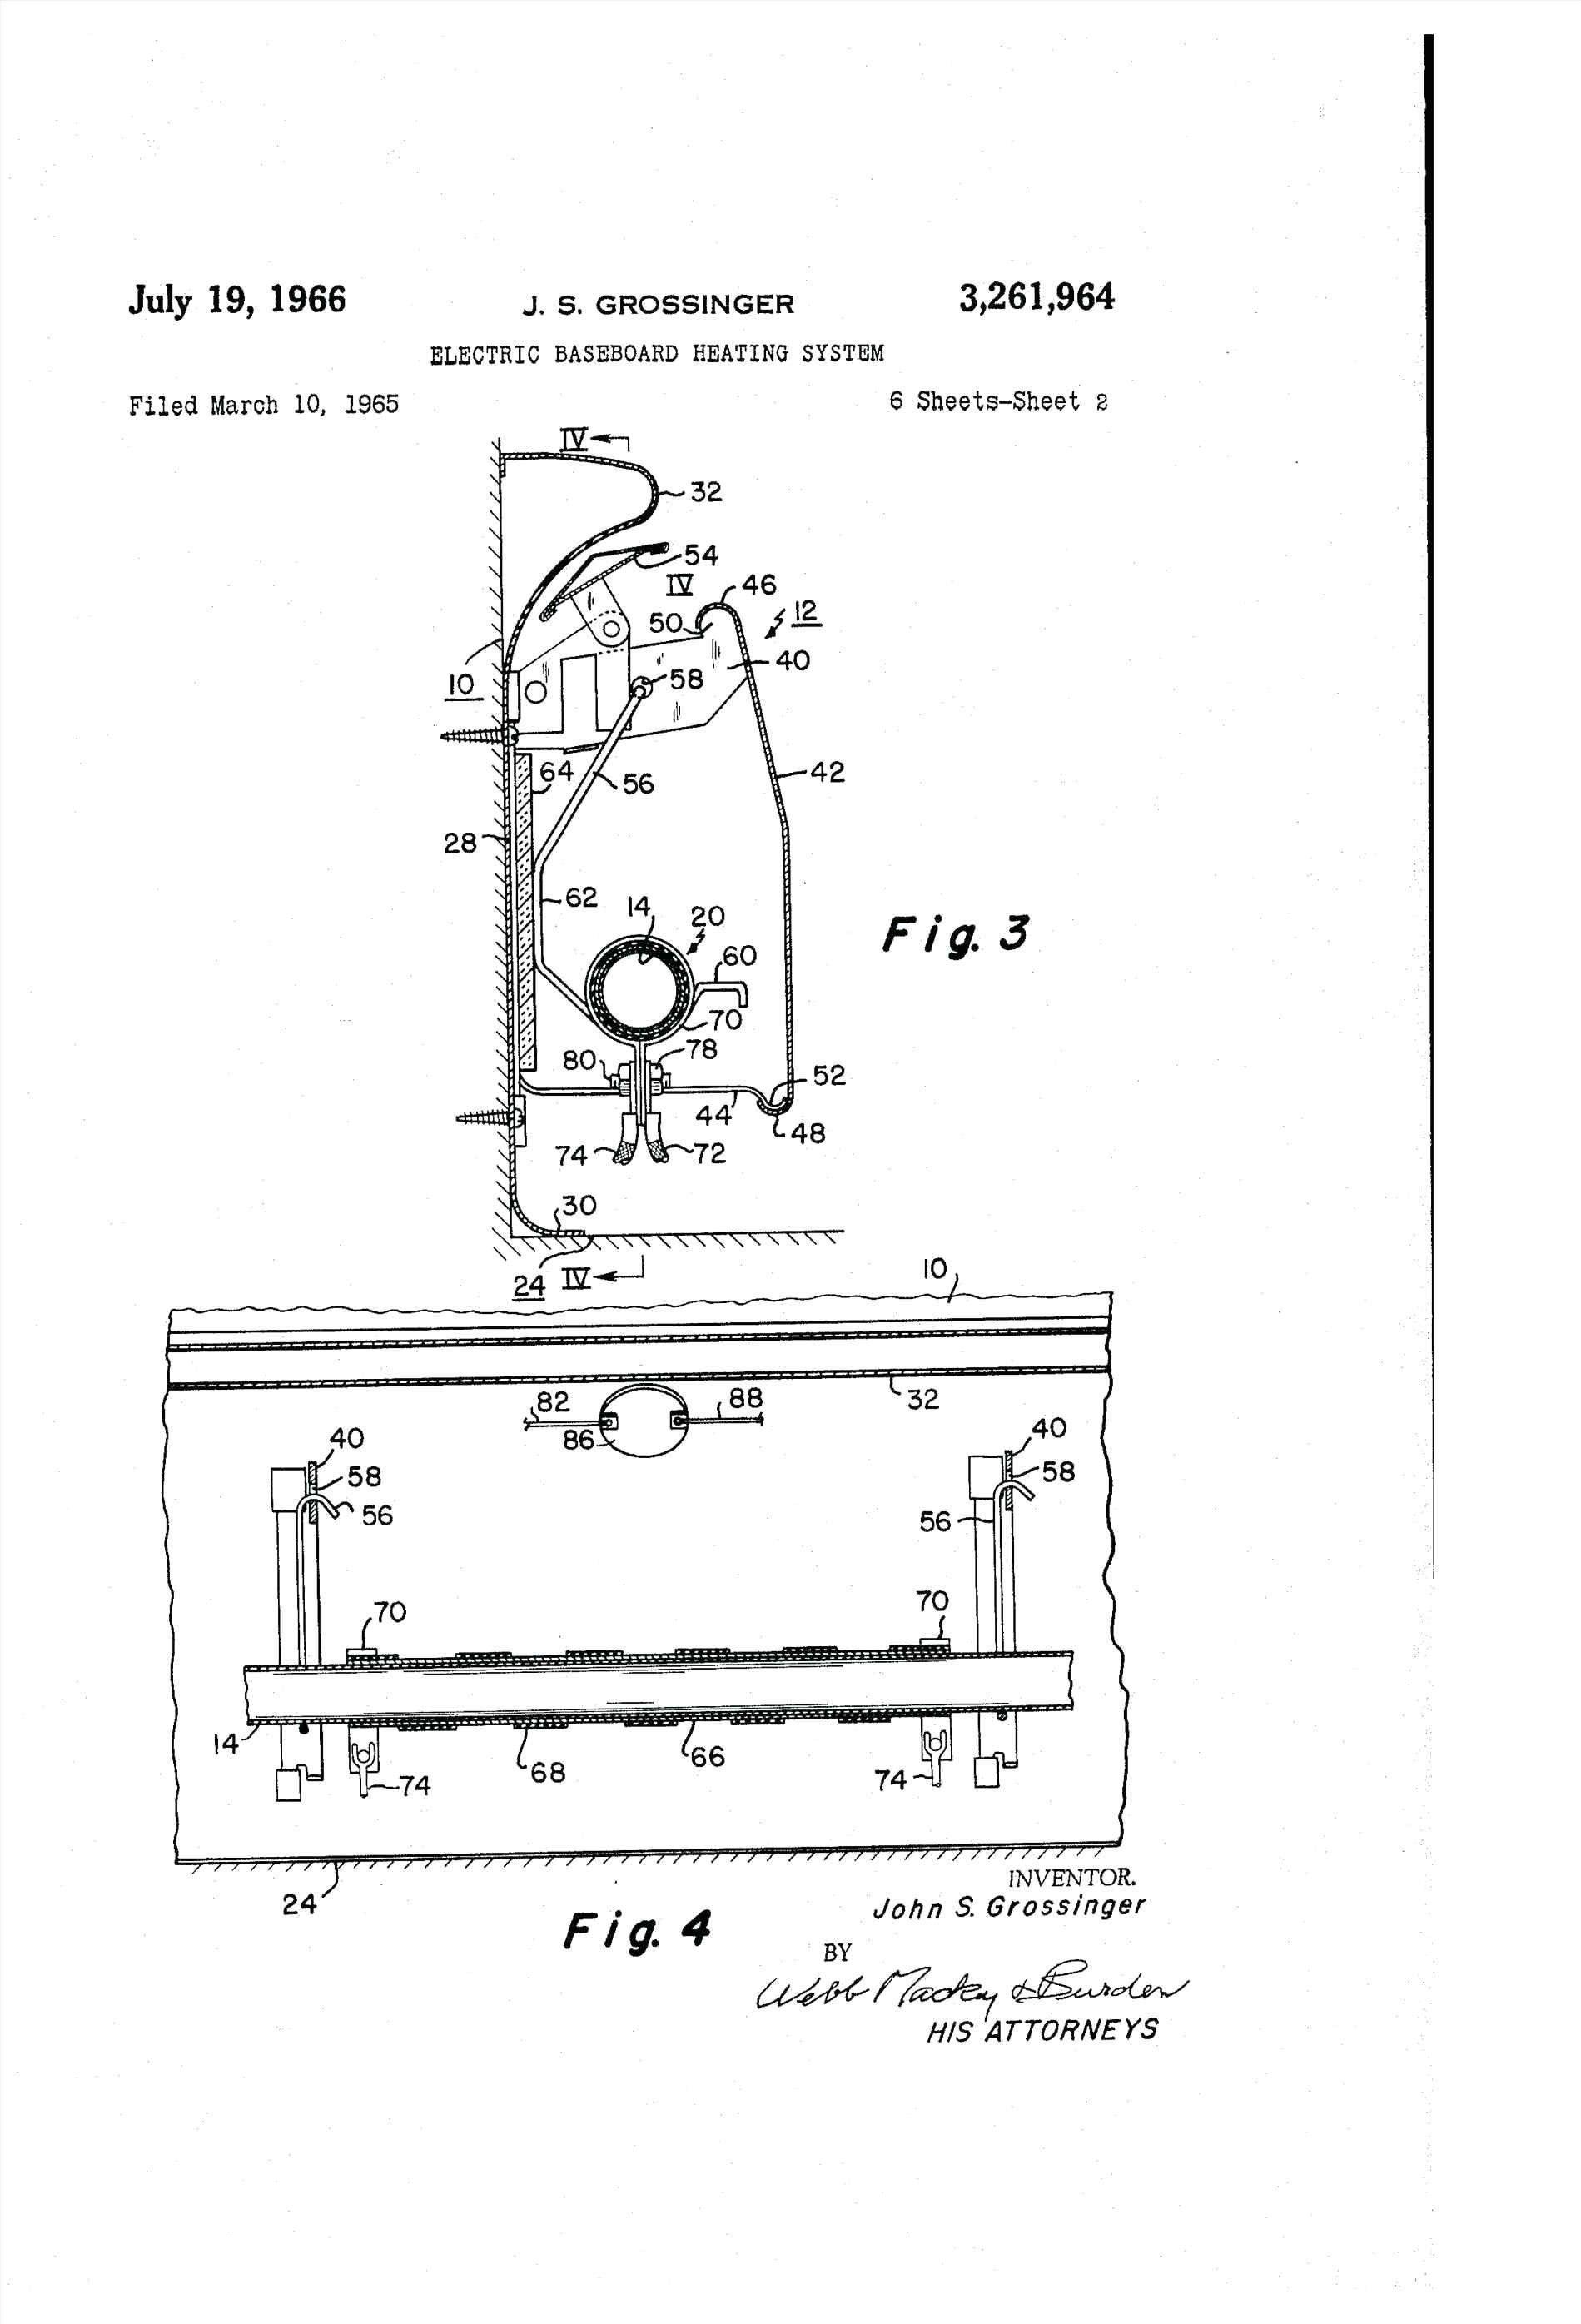 small resolution of viper alarm 5305v wiring diagram from vehicle alarm system diagramviper alarm v wiring diagram from on